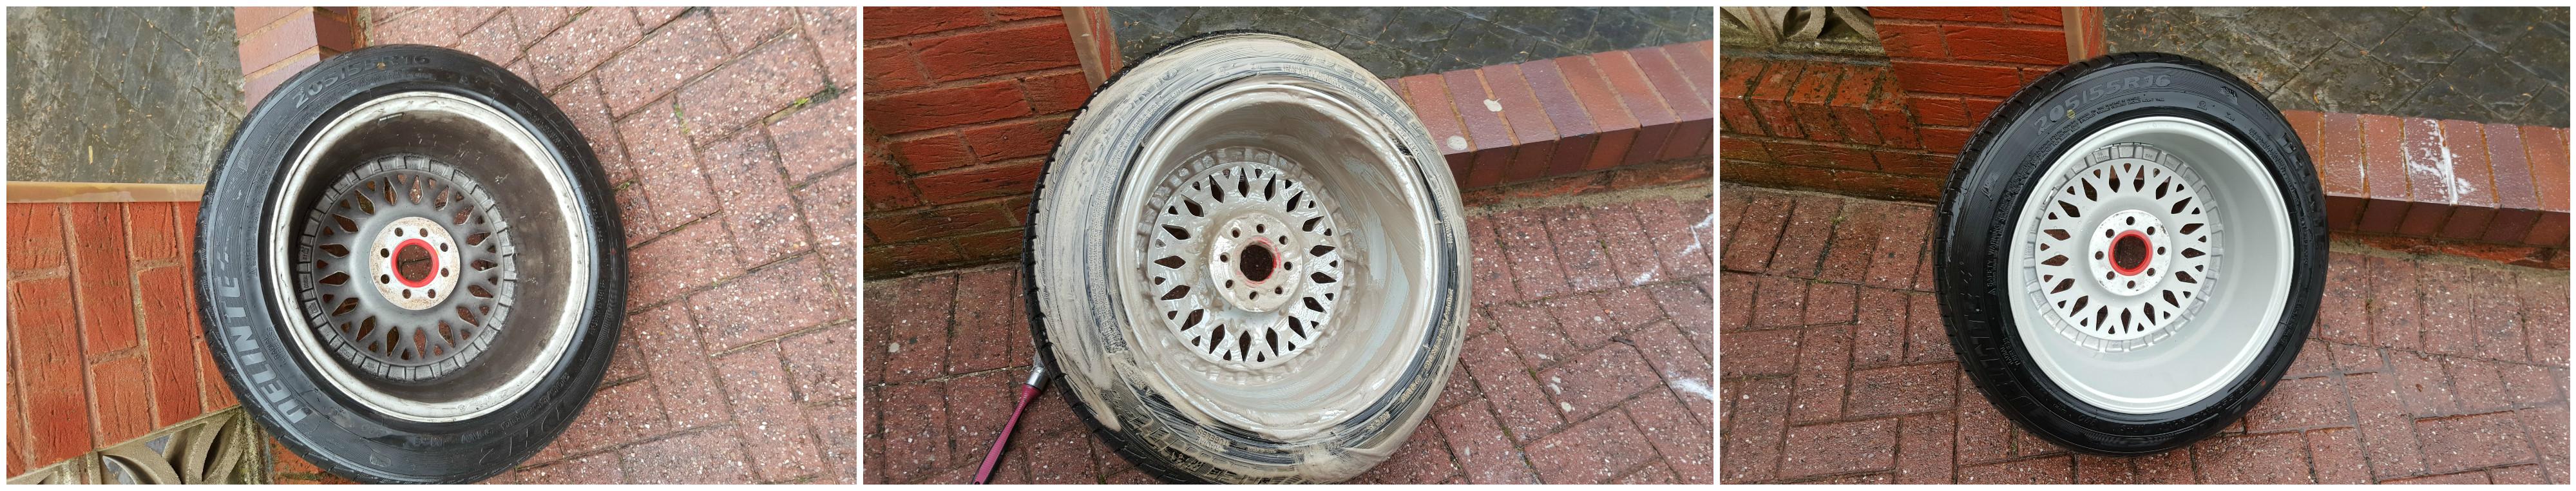 wheelbeforeduringafter